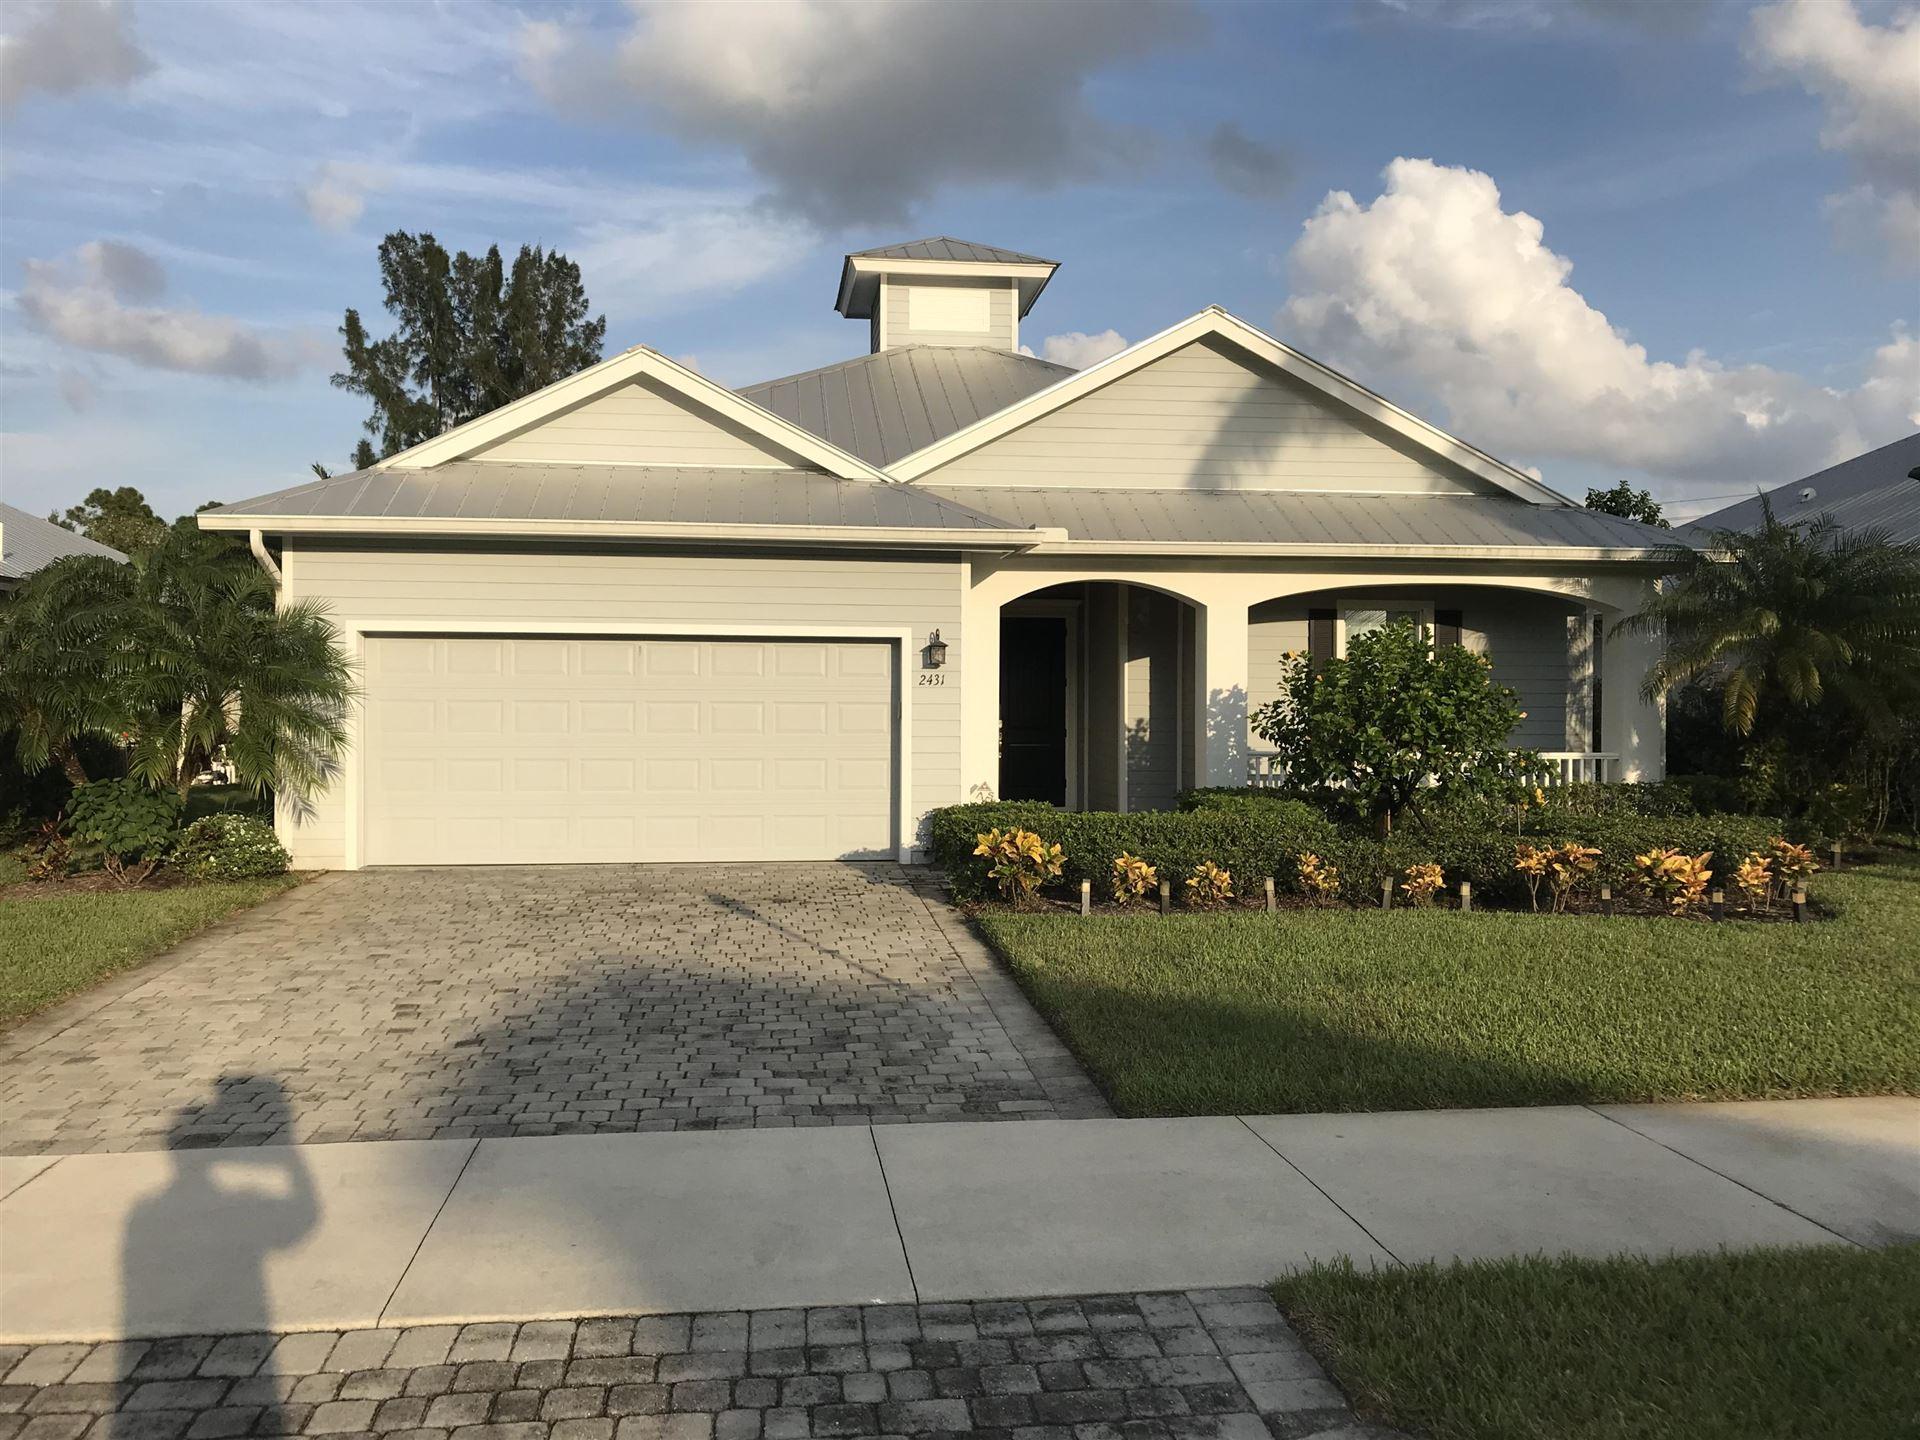 2431 NW Hummingbird Circle, Stuart, FL 34994 - #: RX-10664023